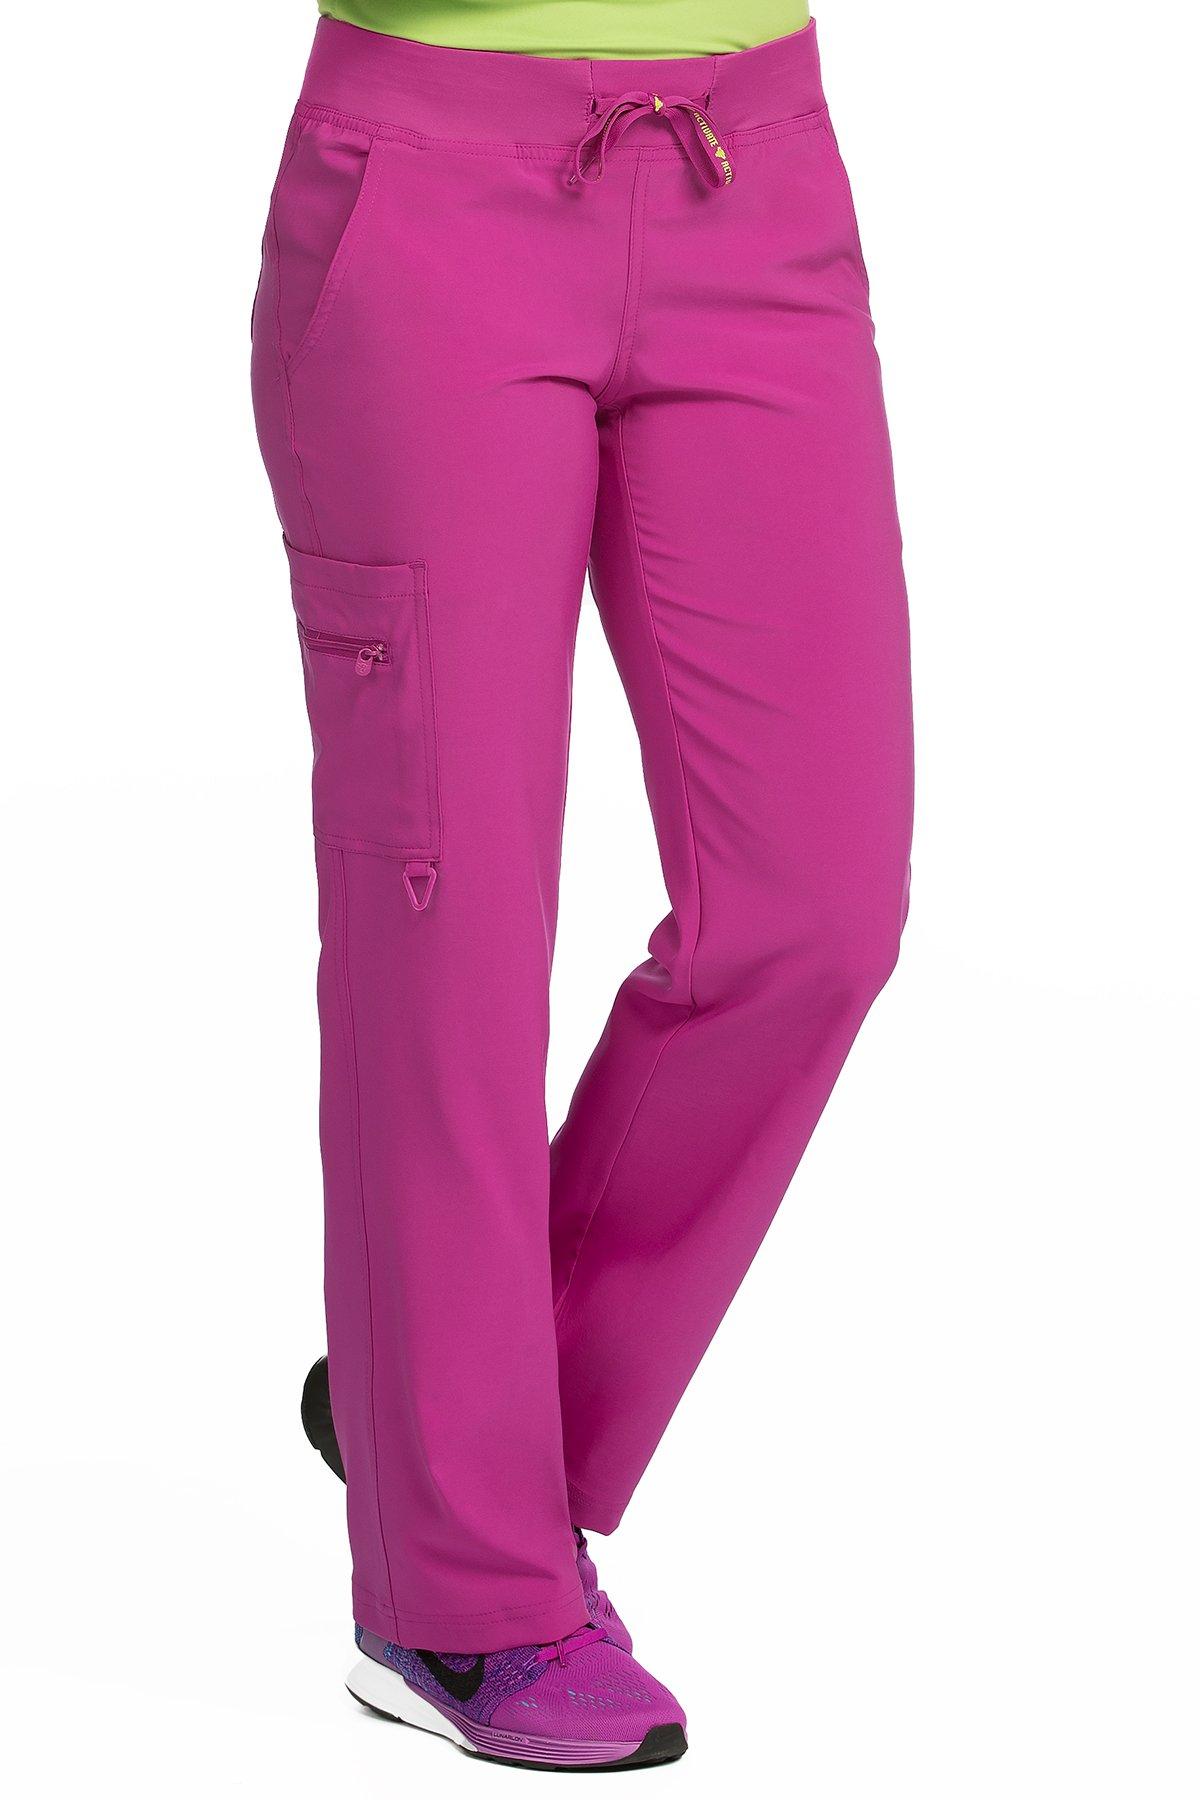 Med Couture Scrub Pants Women, Yoga Cargo Pocket Scrub Pant, XX-Large, Magenta